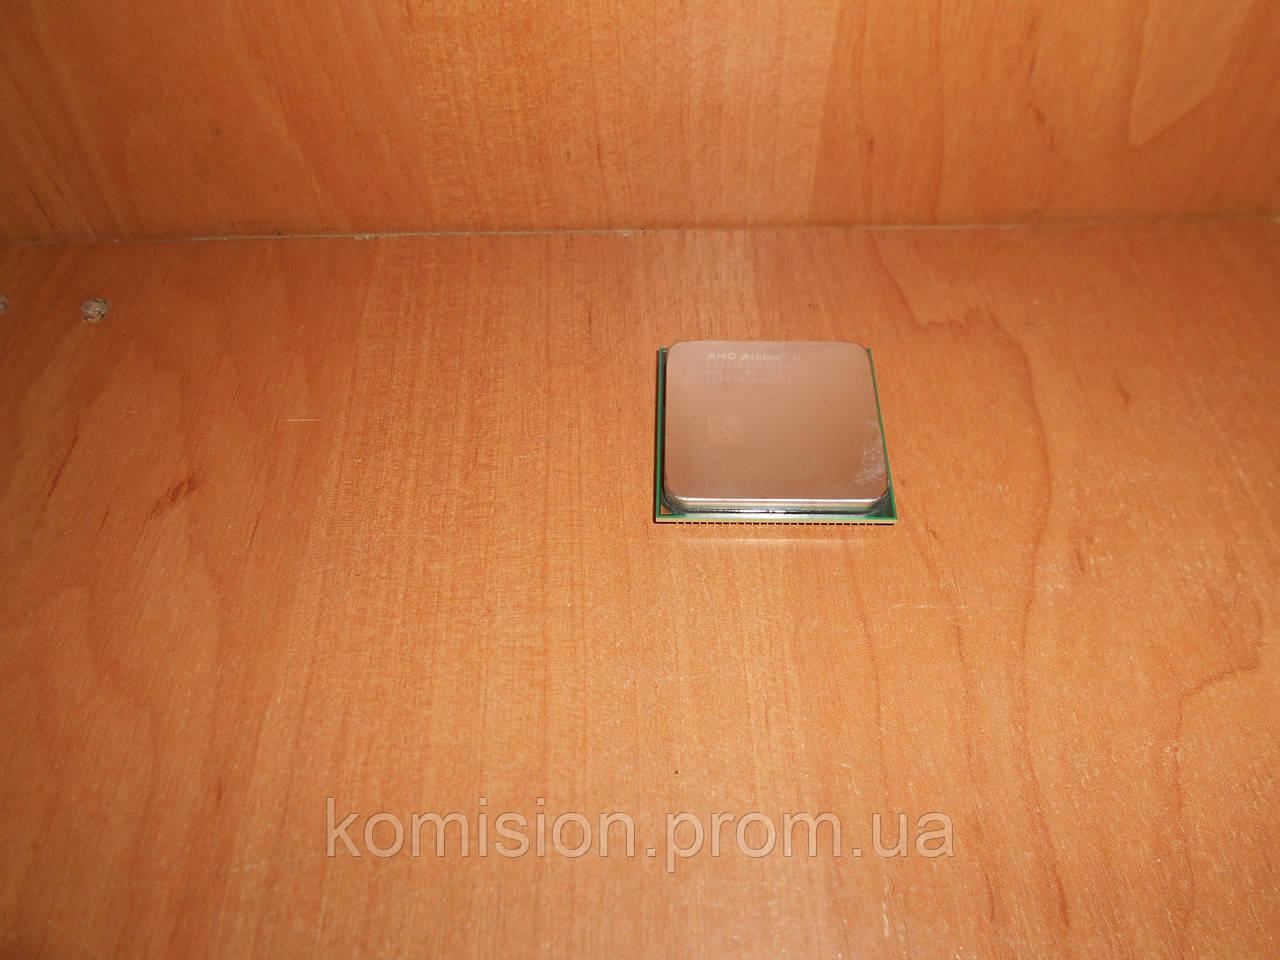 Процессор AMD Athlon II X2 250 3,0 GHz sAM3 sAM2+